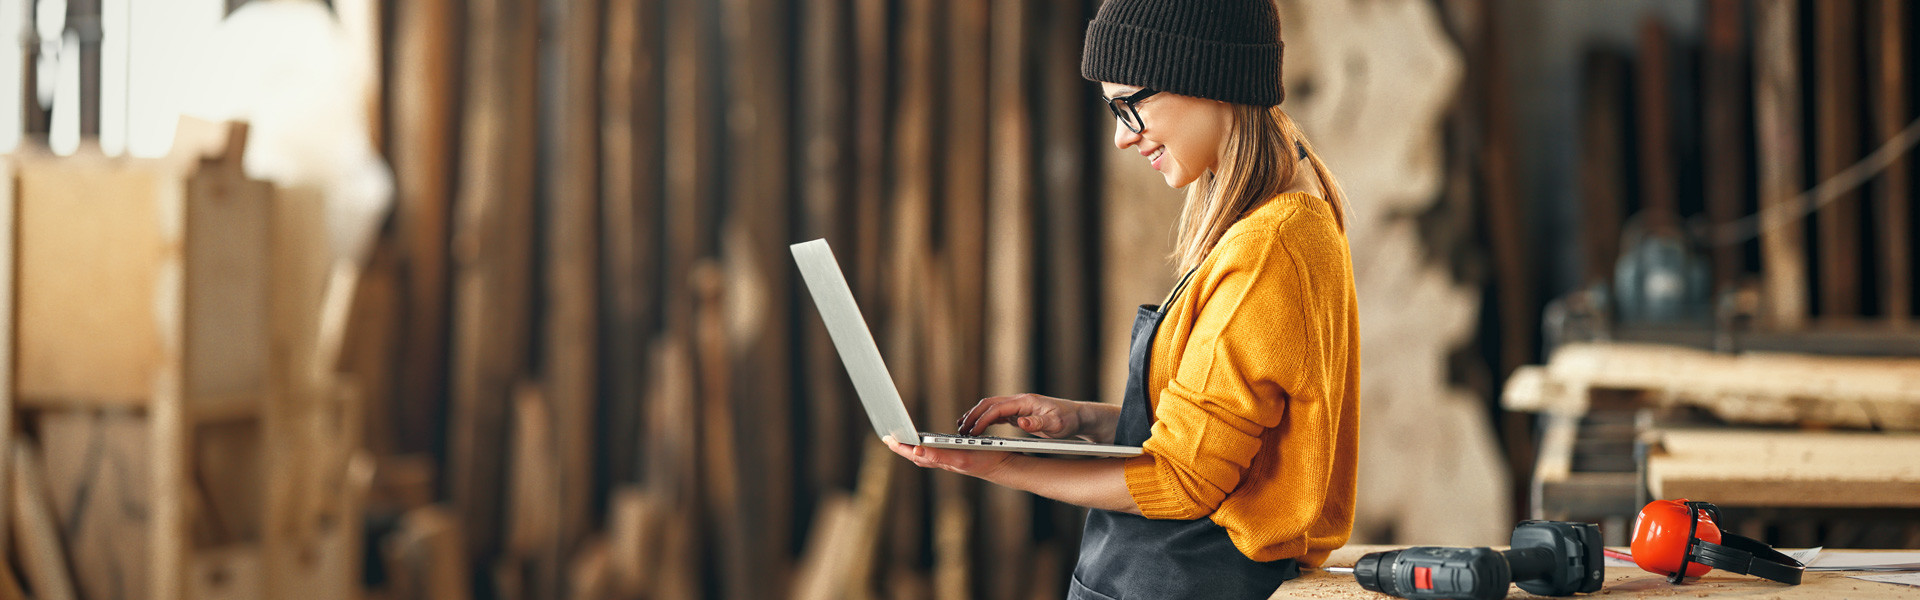 Frau mit Laptop in Montagehalle © Adobe Stock, JenkoAtaman